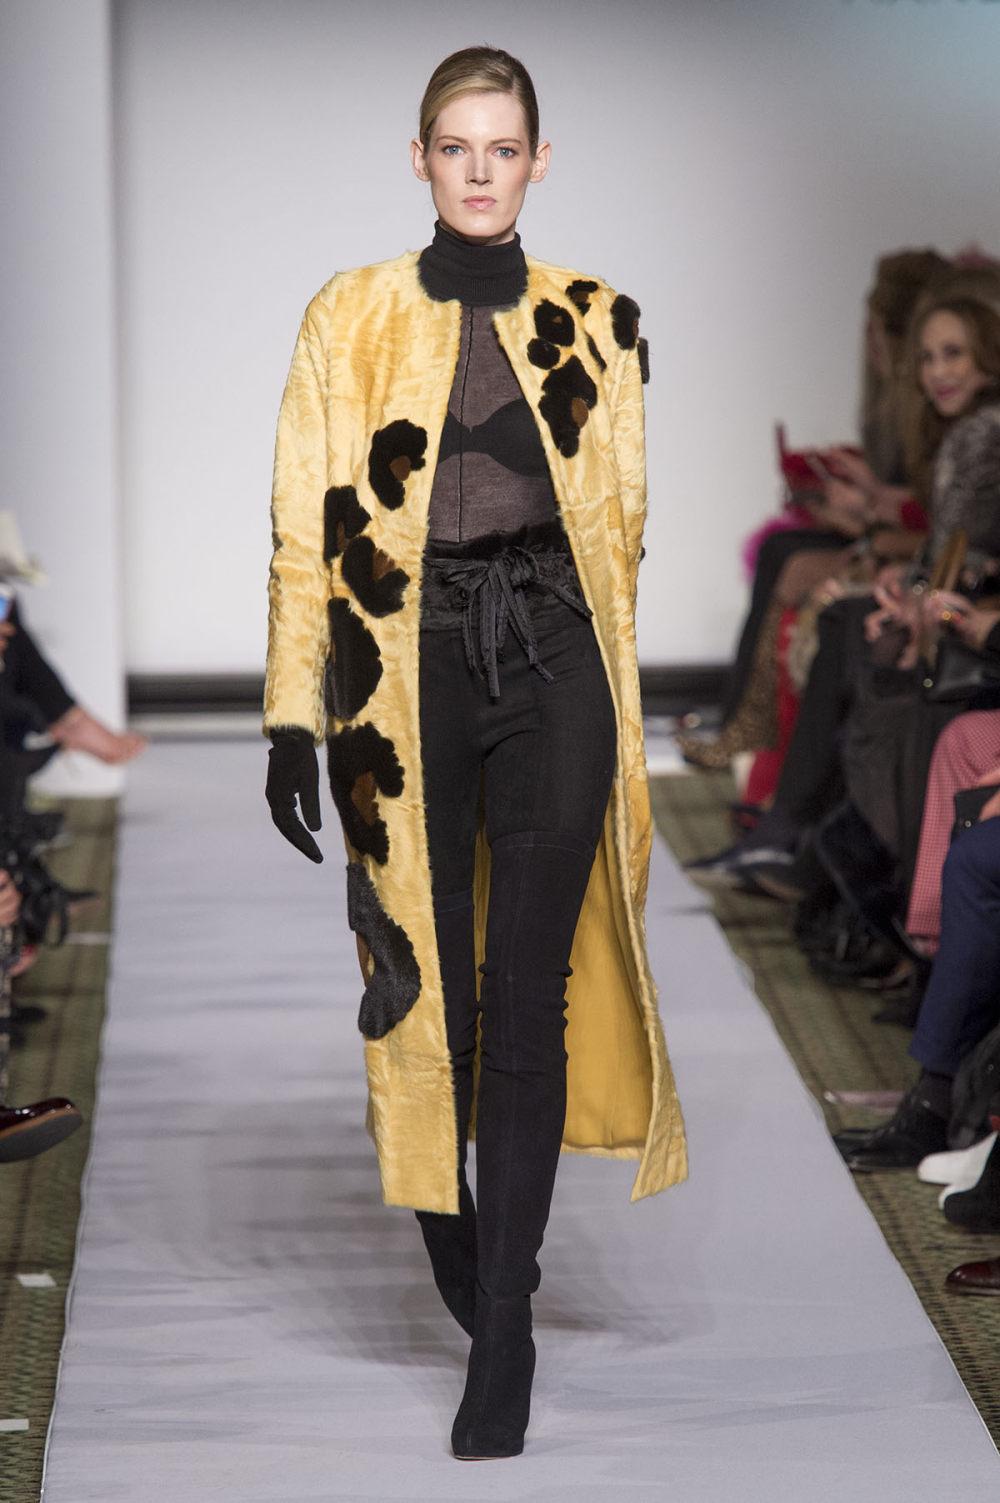 Carolina Herrera时装系列用鲜艳的颜色充满智能的黑白色调-4.jpg